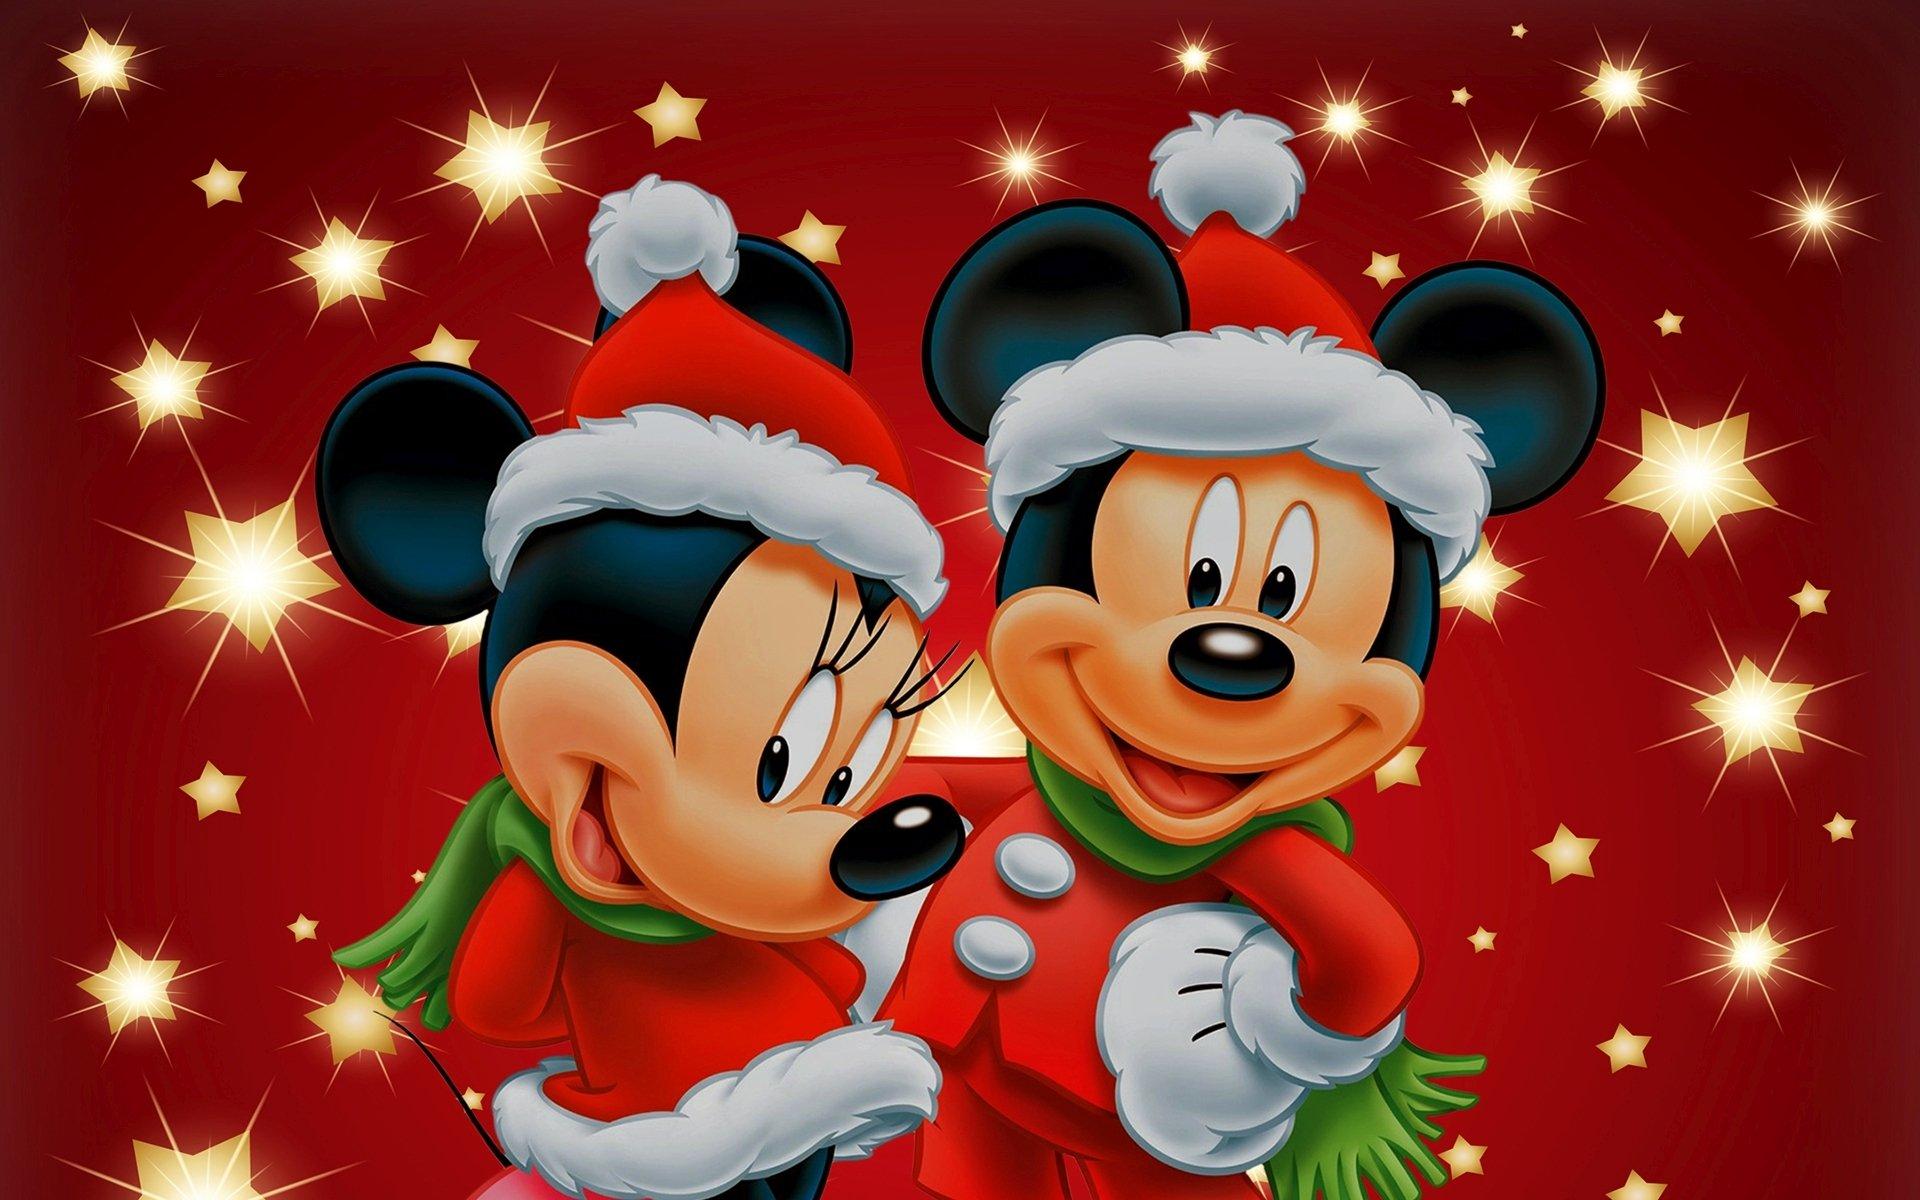 Mickey and minnie winter wallpaper wallpapersafari - Fondos de minnie mouse ...